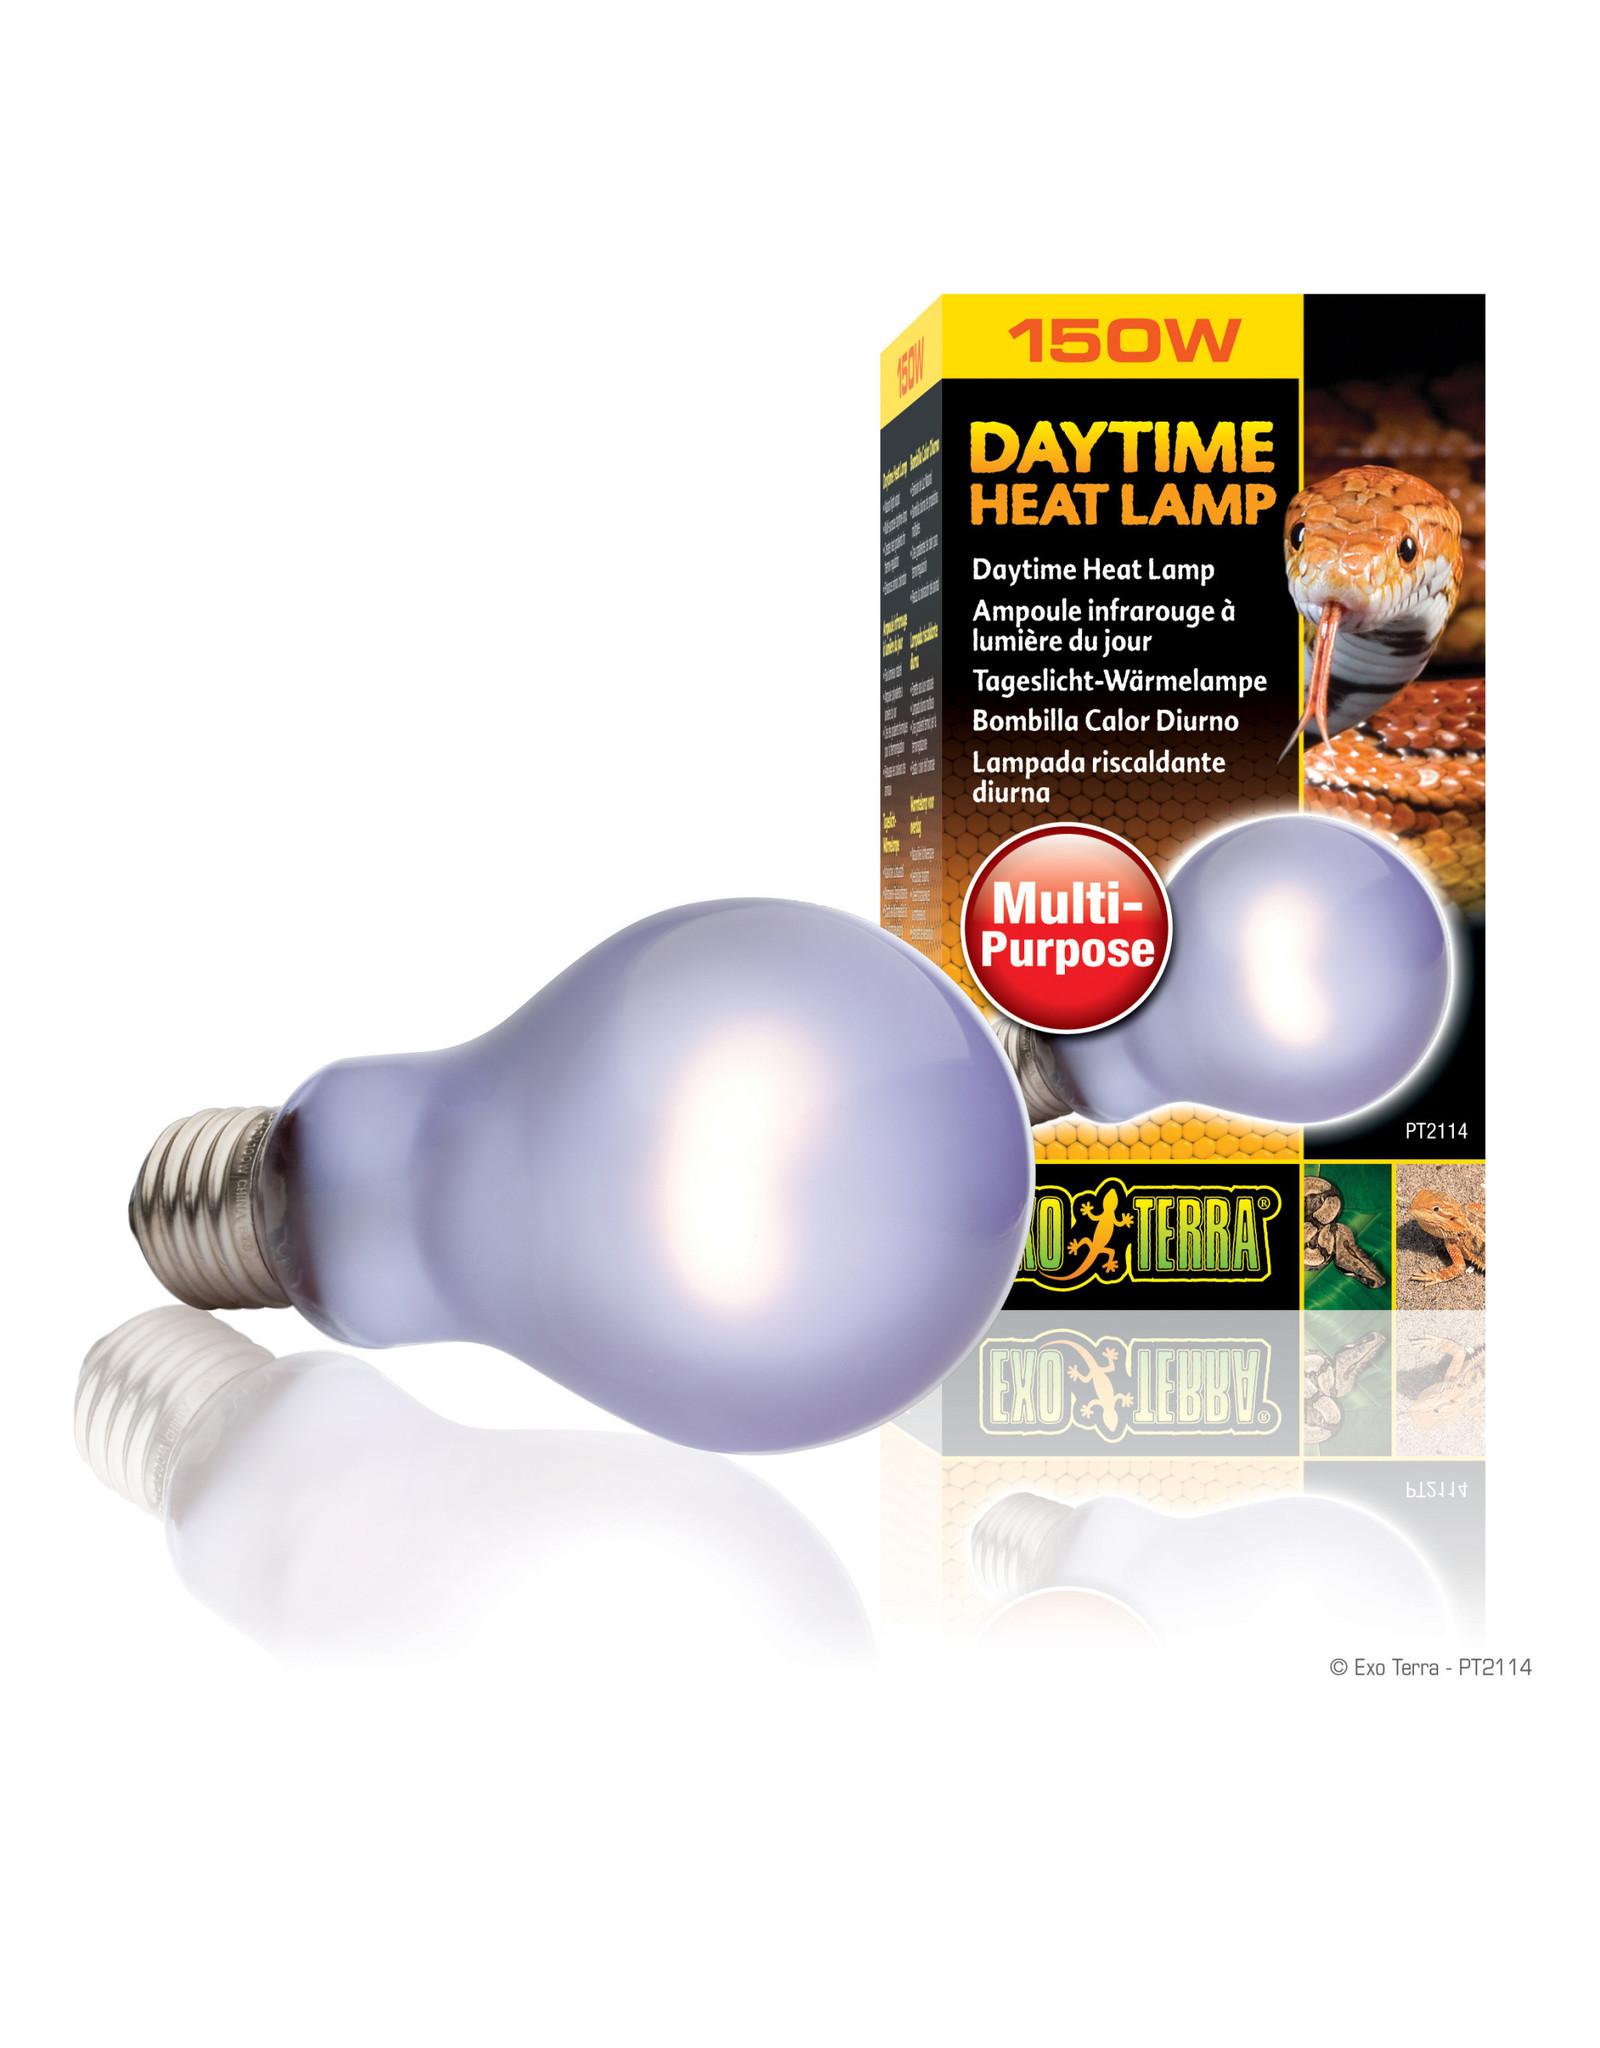 Exo Terra Daytime Heat Lamp A21/150W